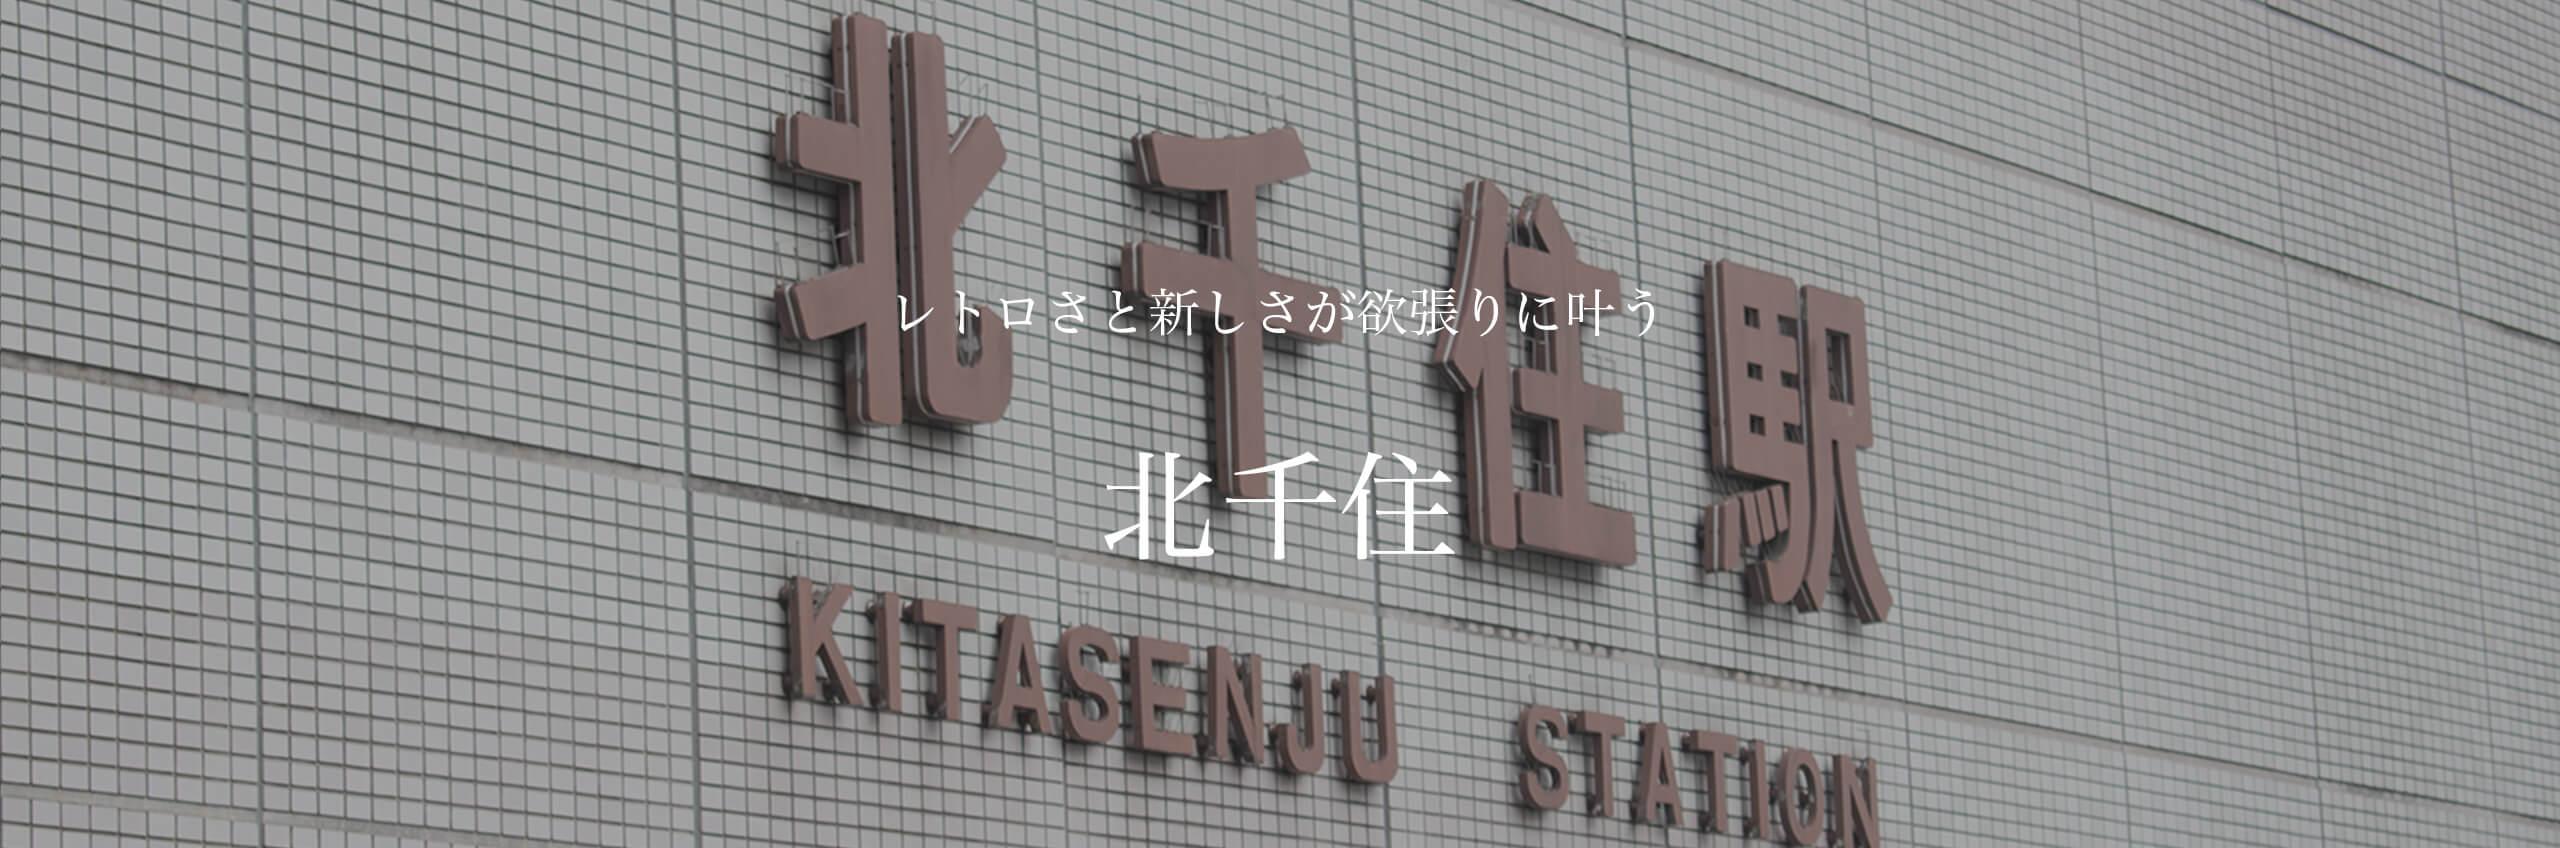 first_view-first_view-town_kitasenju_photo01_firstview-min_20201001.jpg